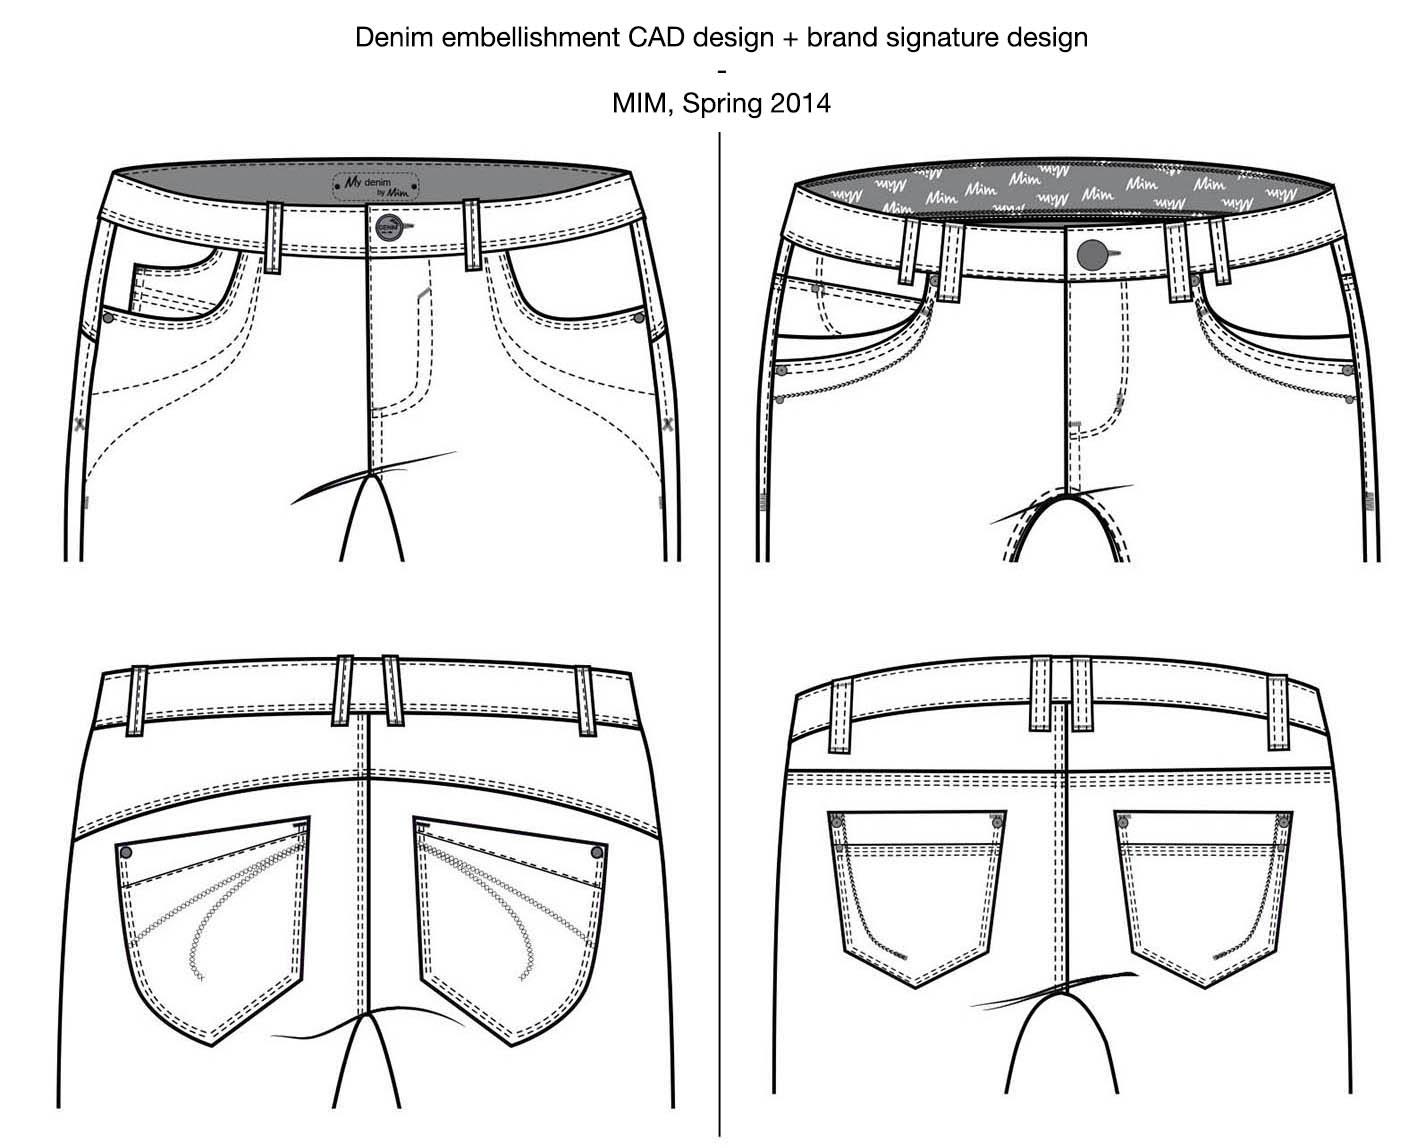 denim brand's signature - pocket embroidery.jpg